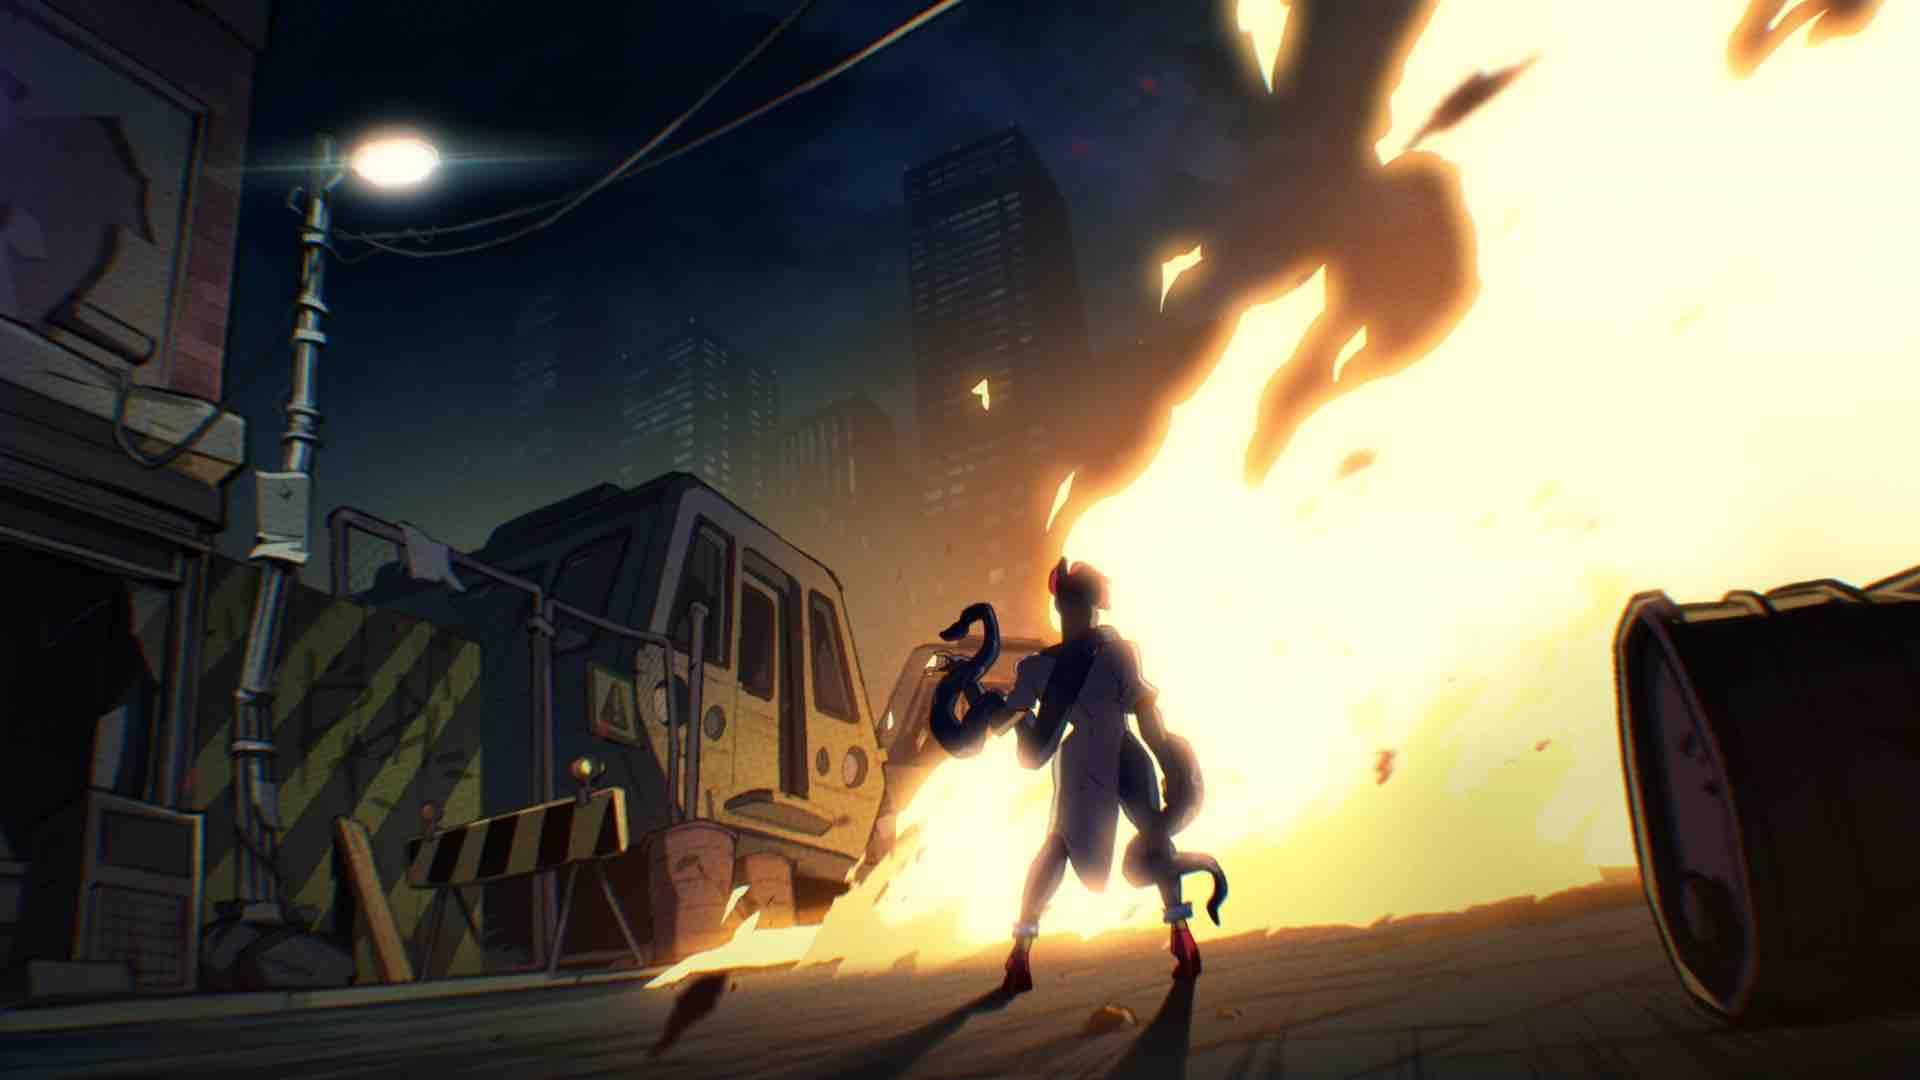 Streets Of Rage 4 Screenshot 4